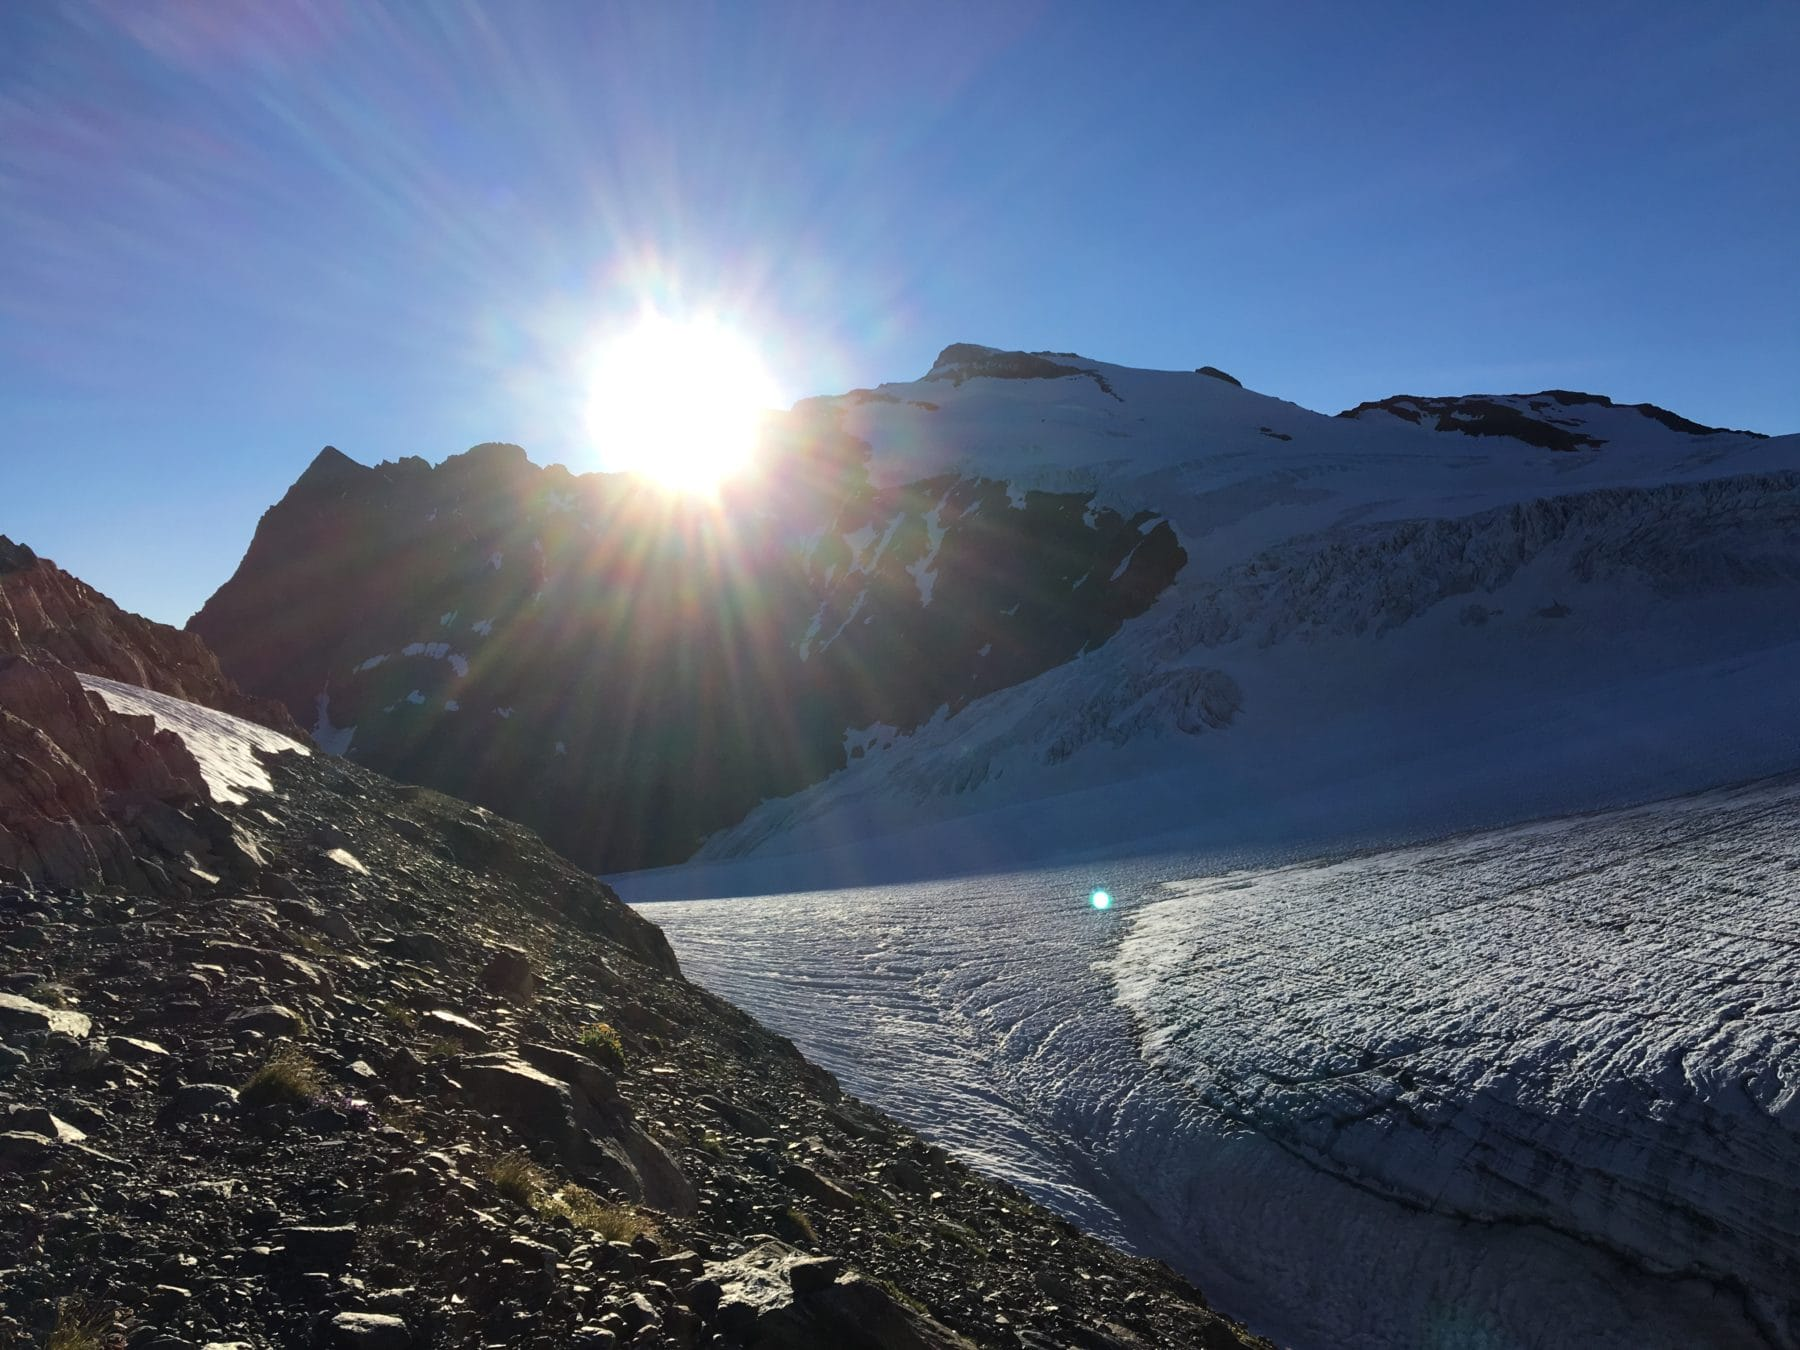 Klettersteig Tierbergli : Tierberglihütte u sac baselland